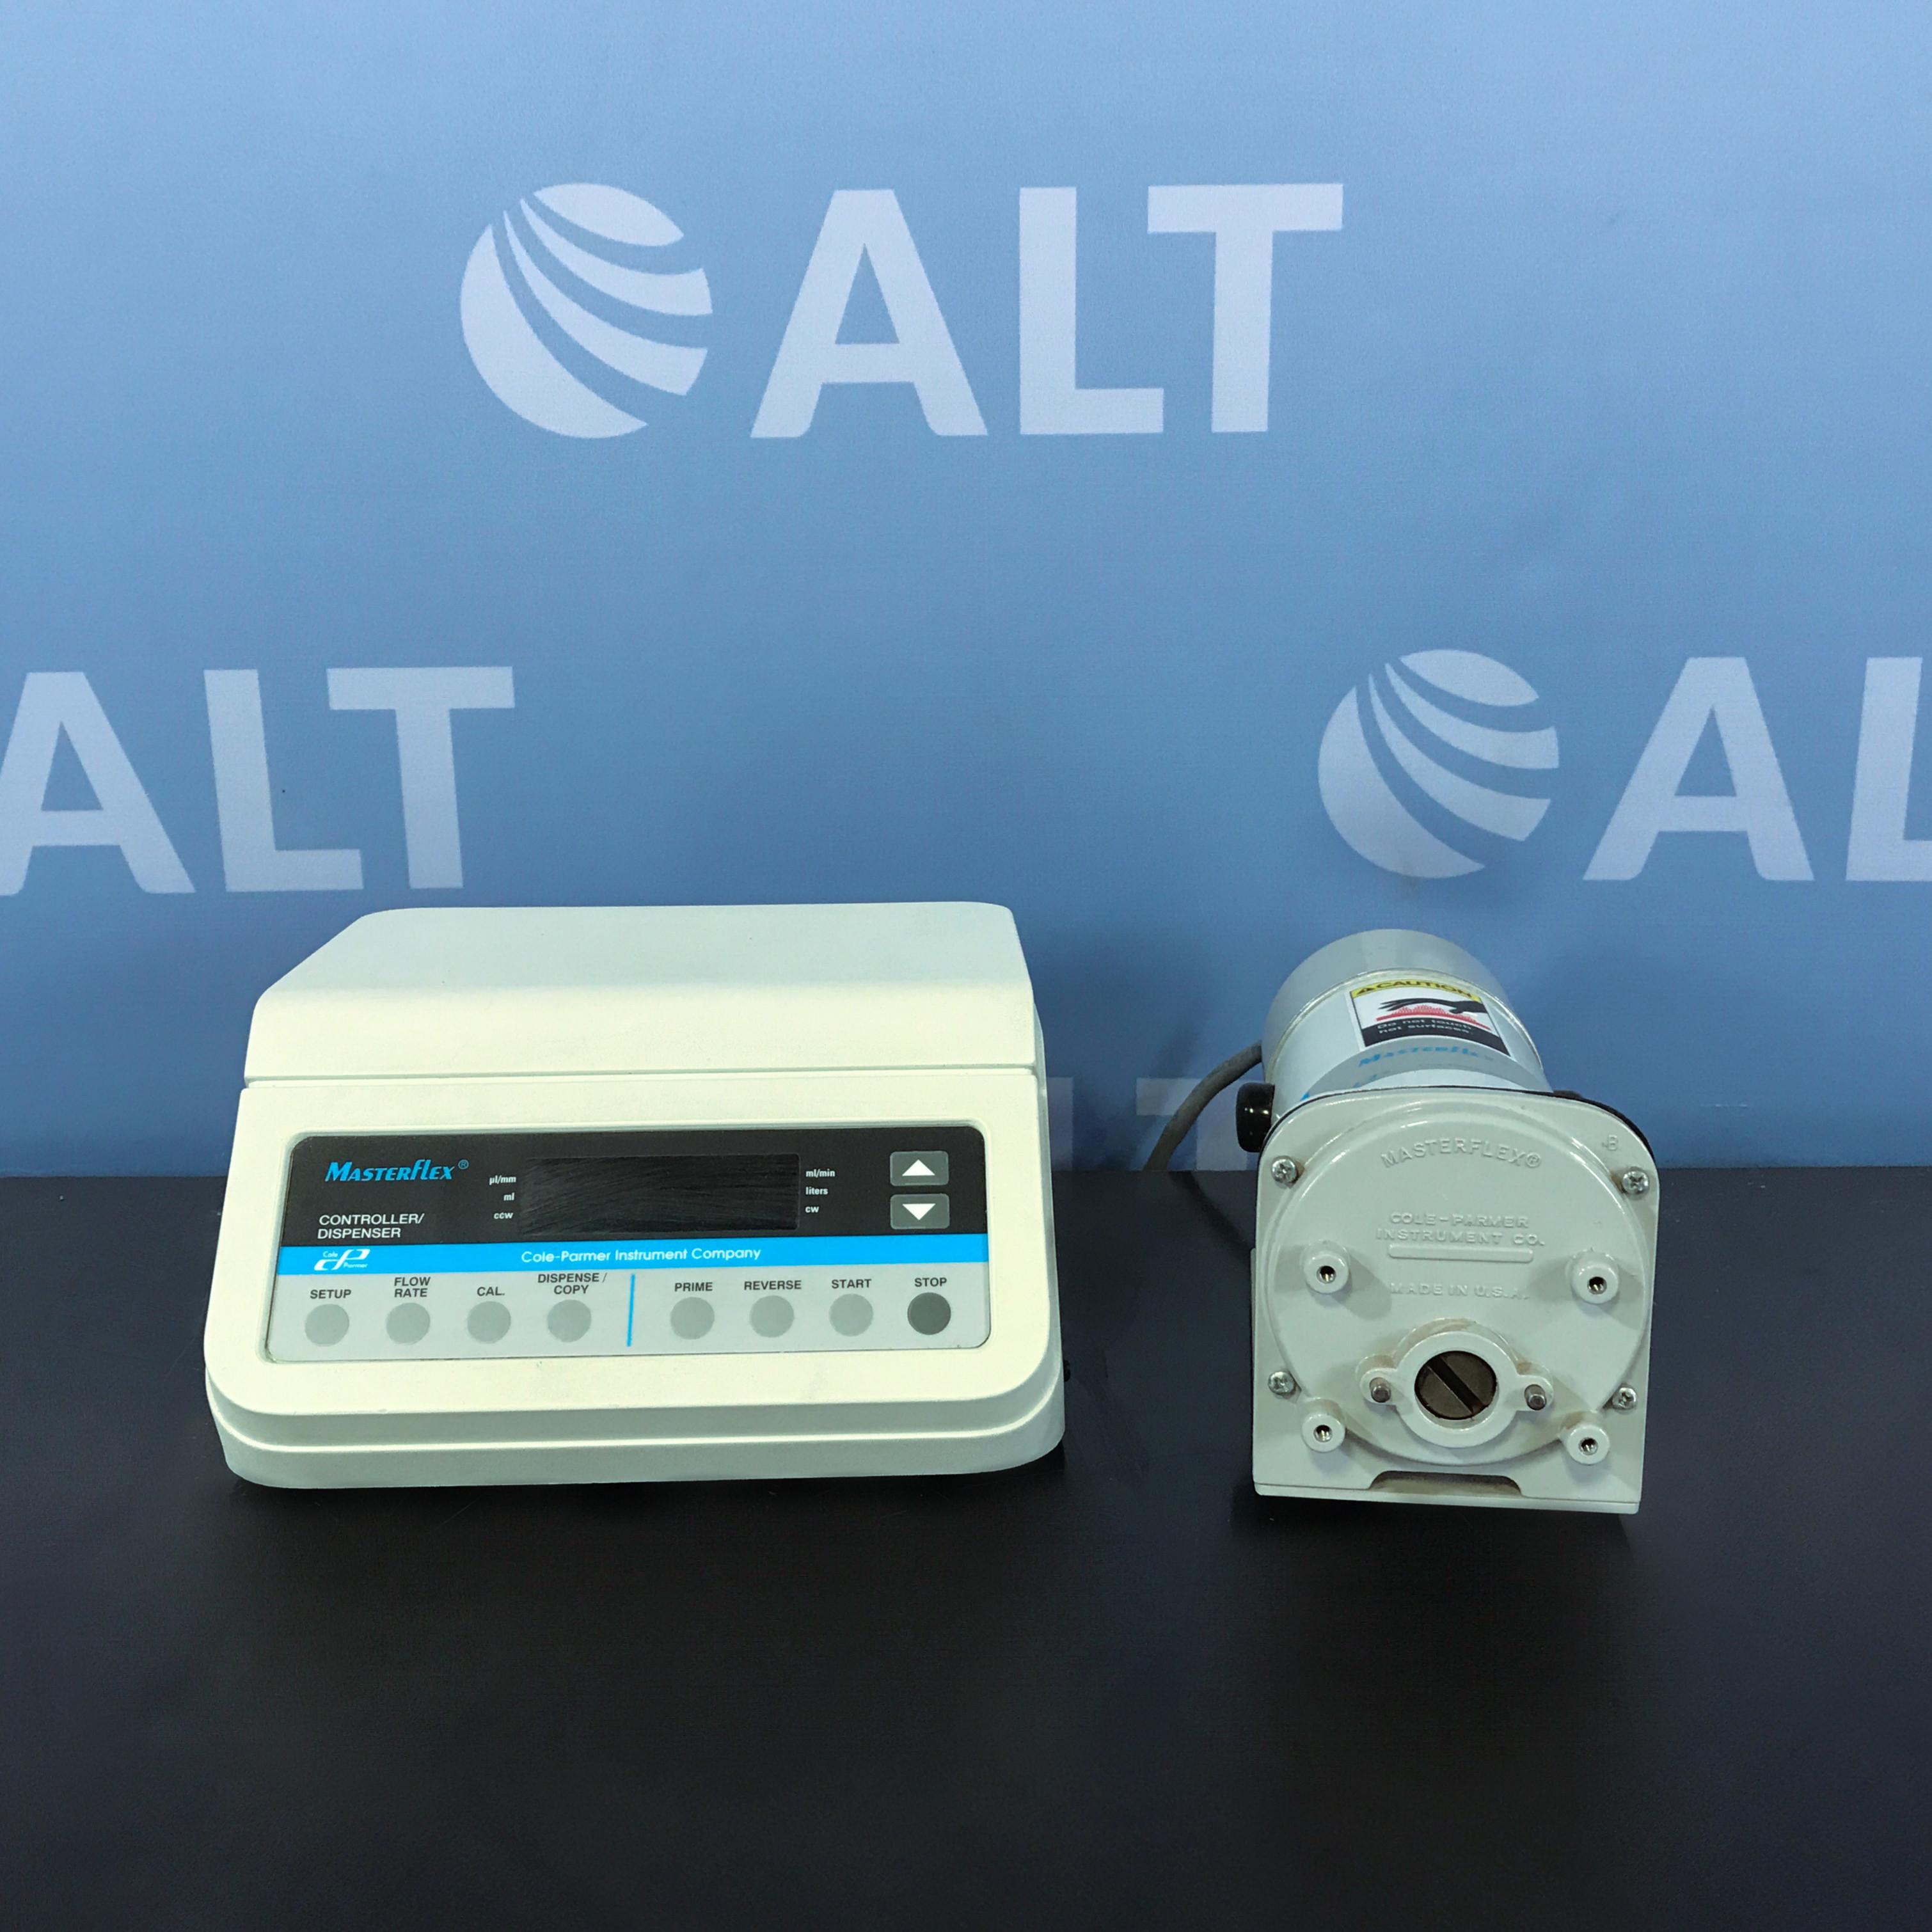 L/S Controller/ Dispenser Pump System w/ Controller 77300-60 and Pump 77300-50 Name